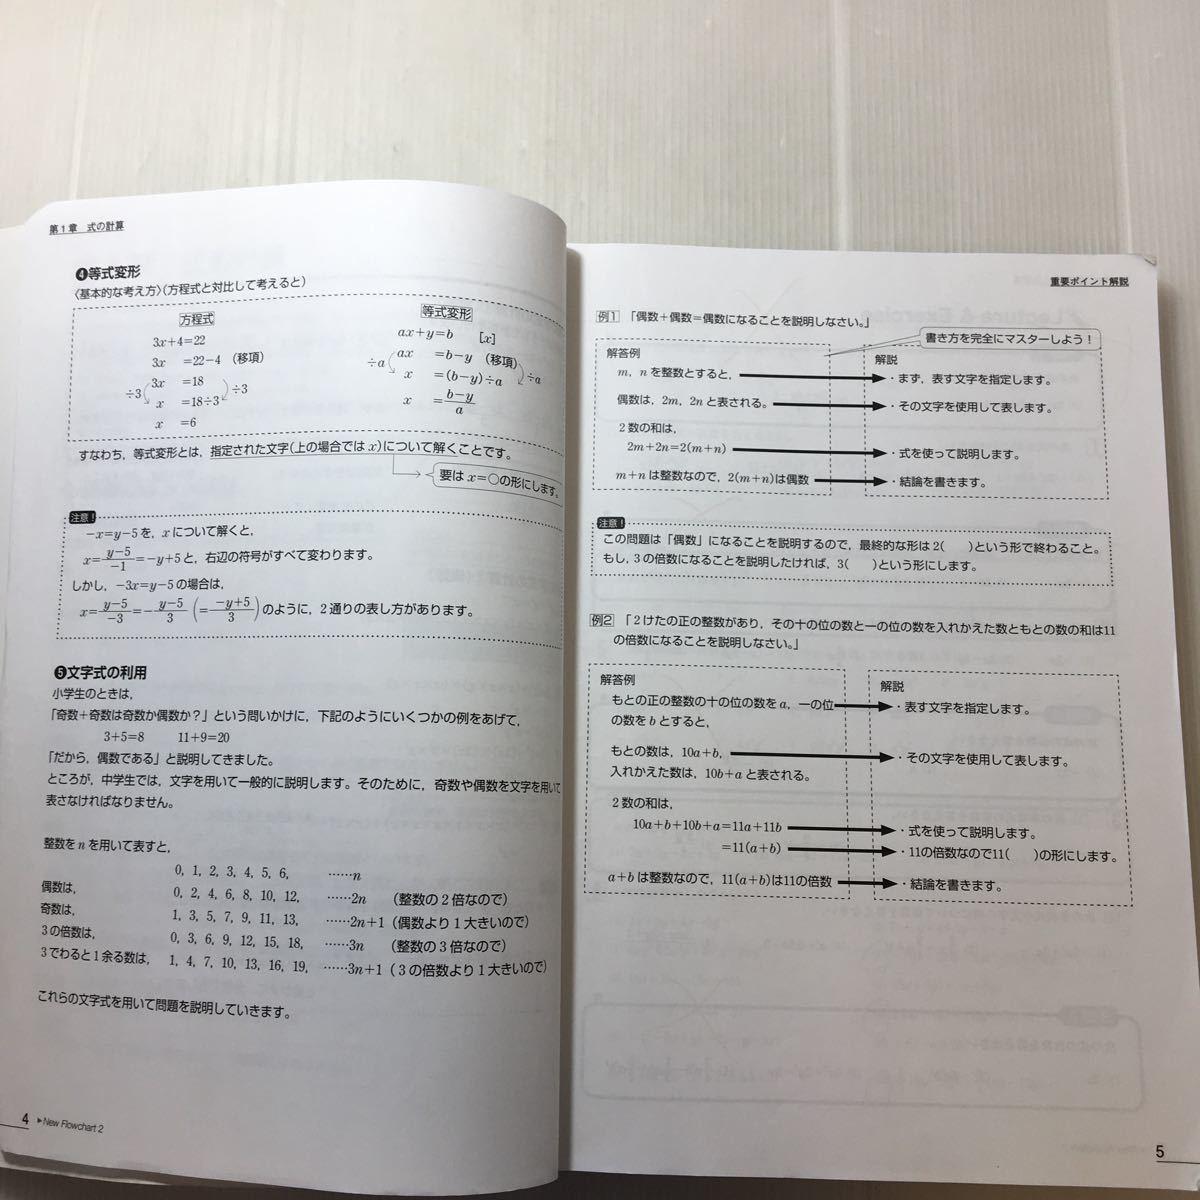 zaa-183♪塾専用  創造学園『Flowchart』 中2数学 問題集 別冊解答付